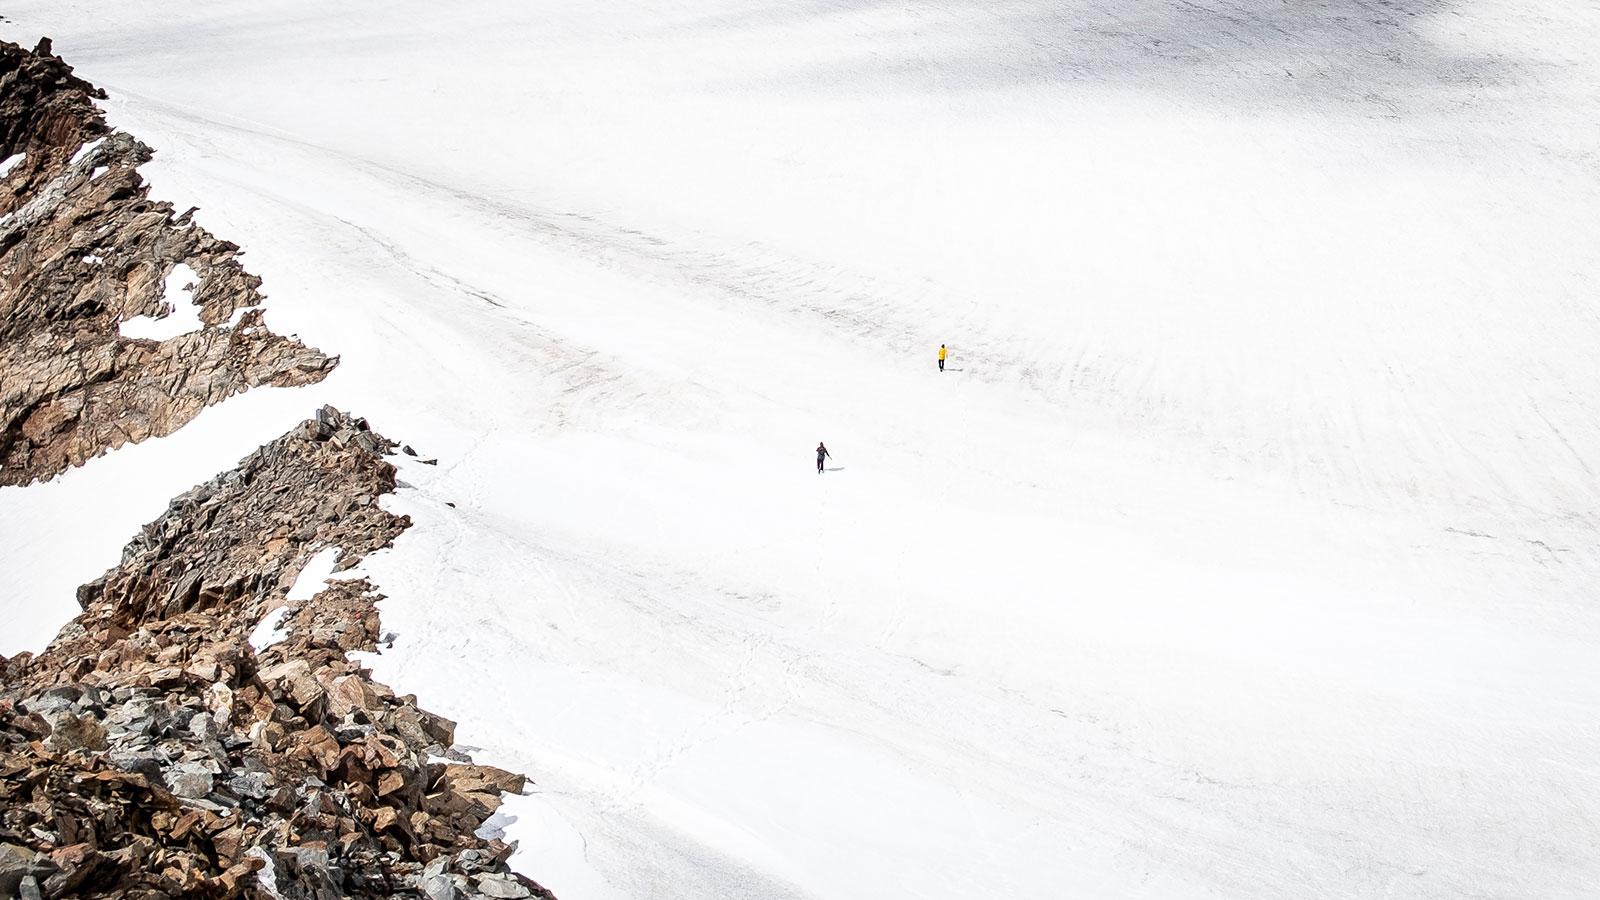 Gletscherberührung. Südtirol | Pauli Trenkwalder, Berge & Psychologie